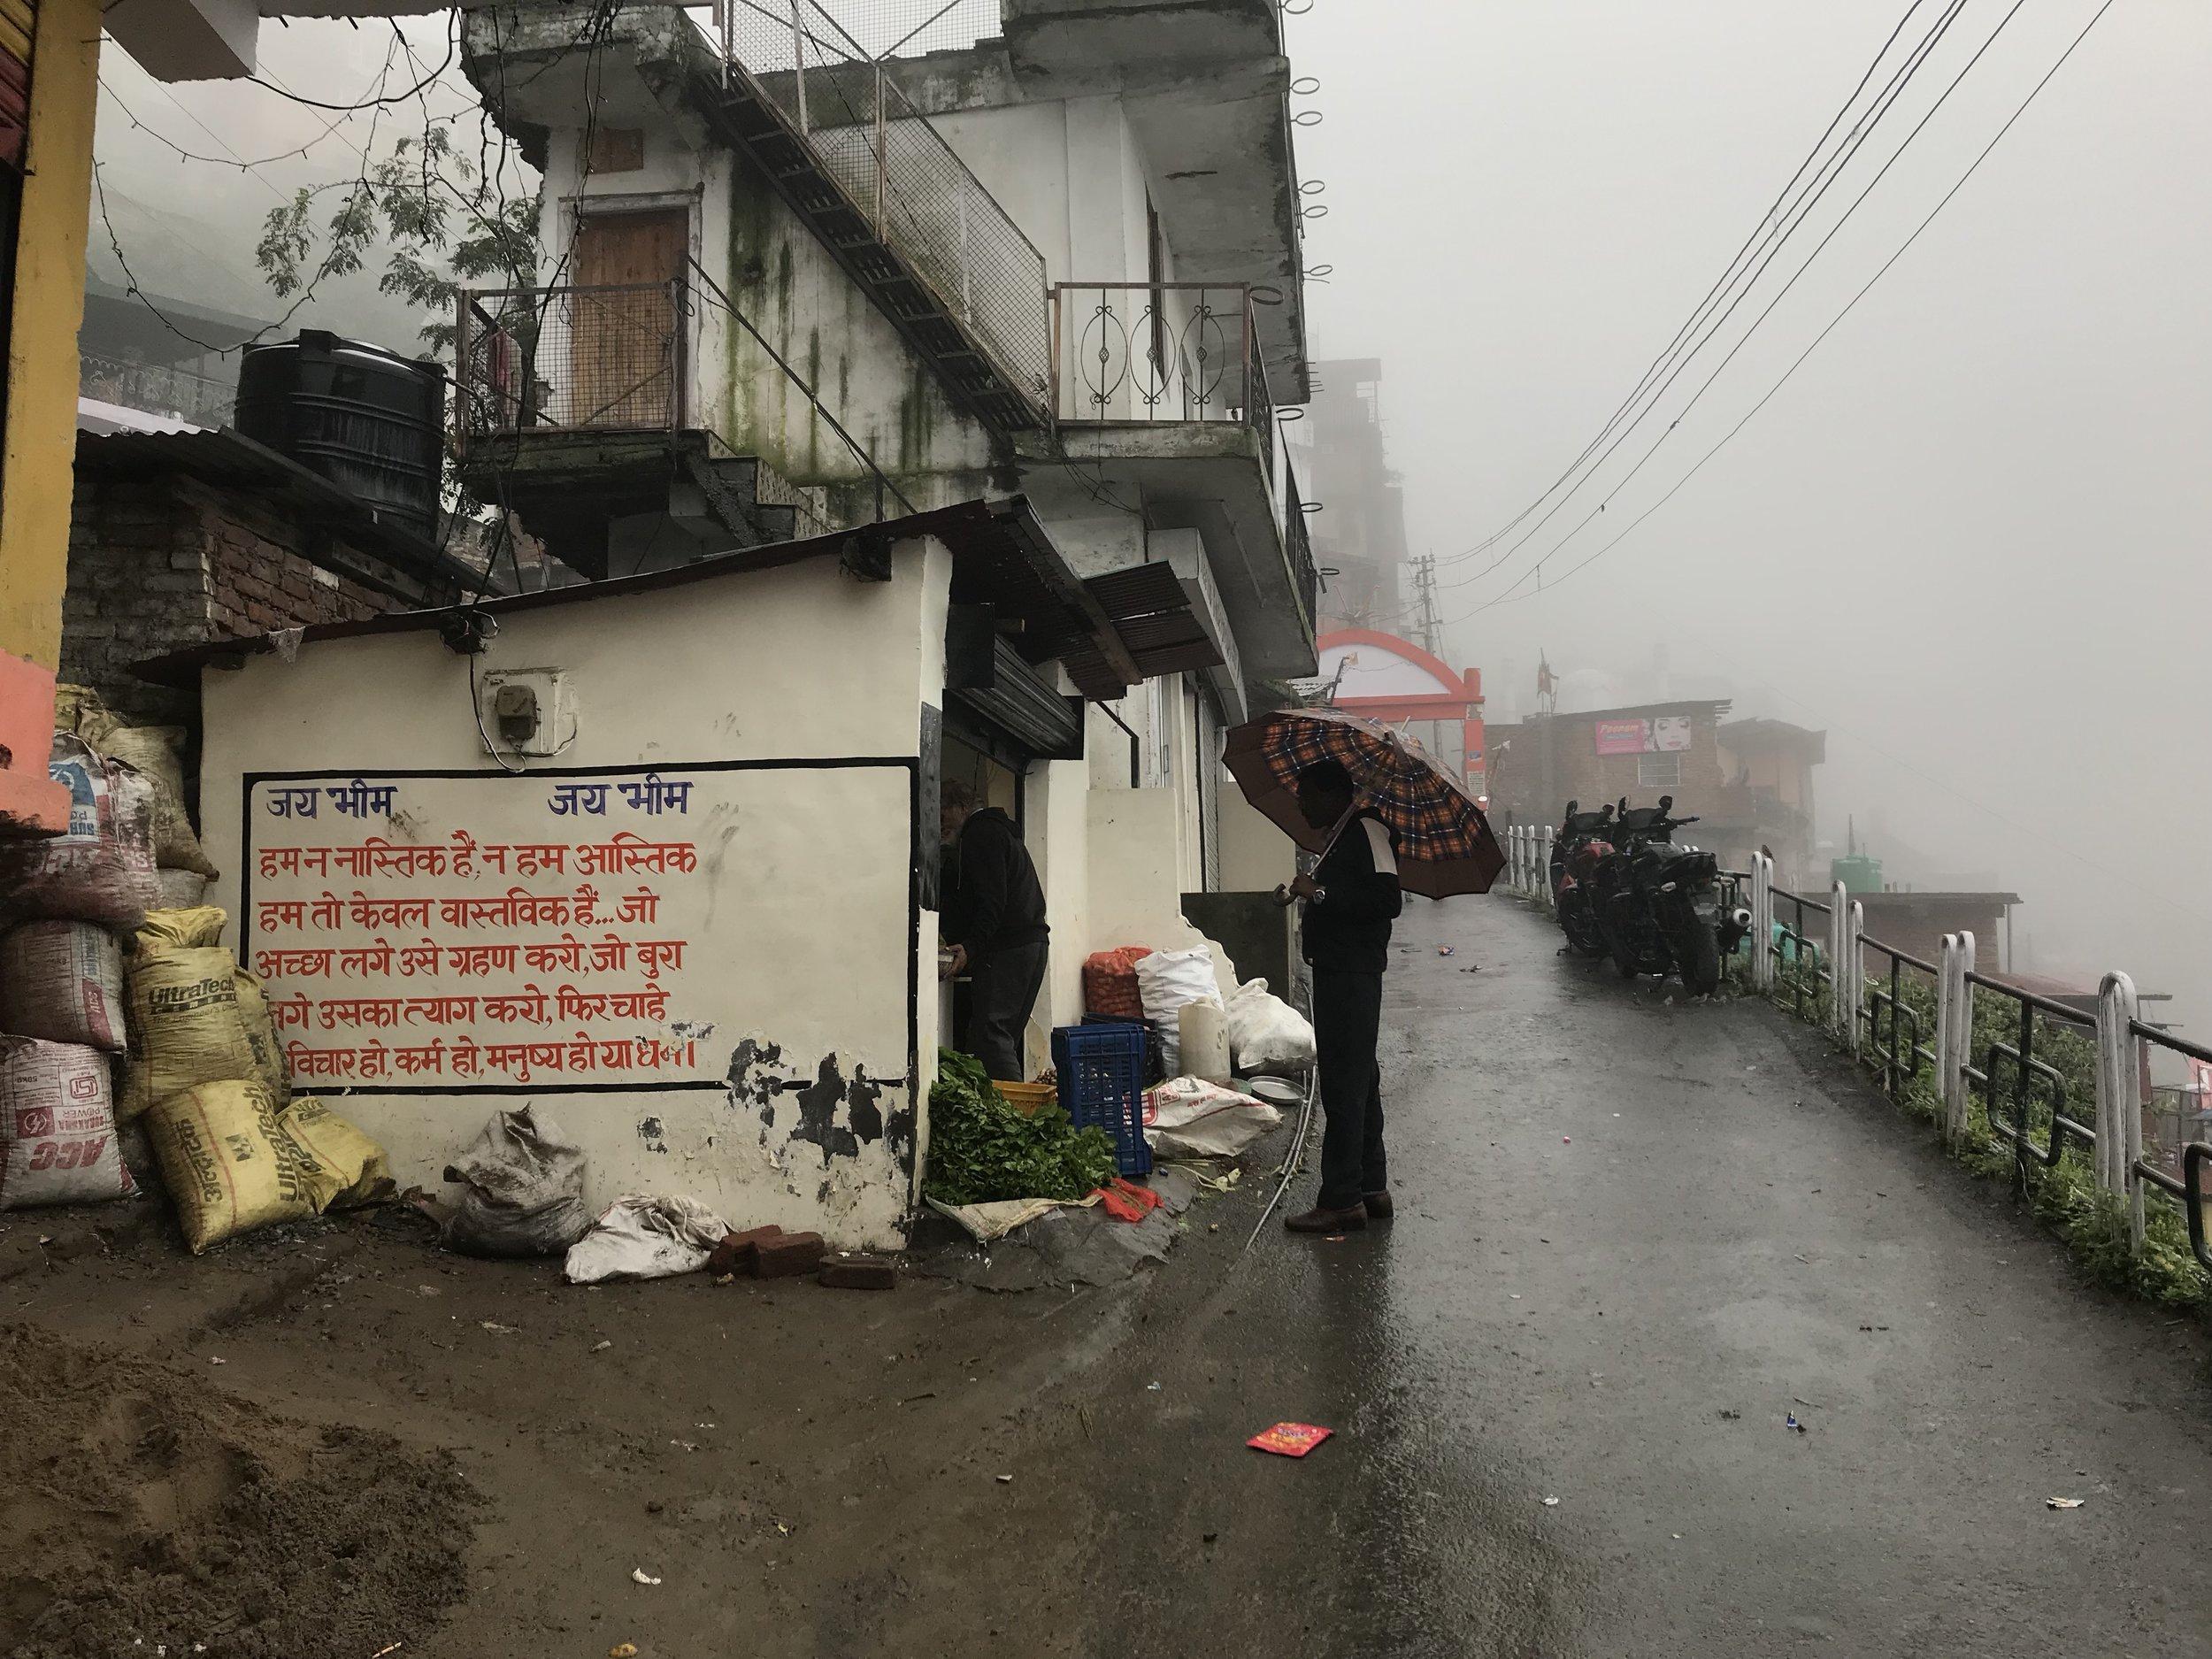 Shimla in the monsoon mist. Photo: Ayona Datta